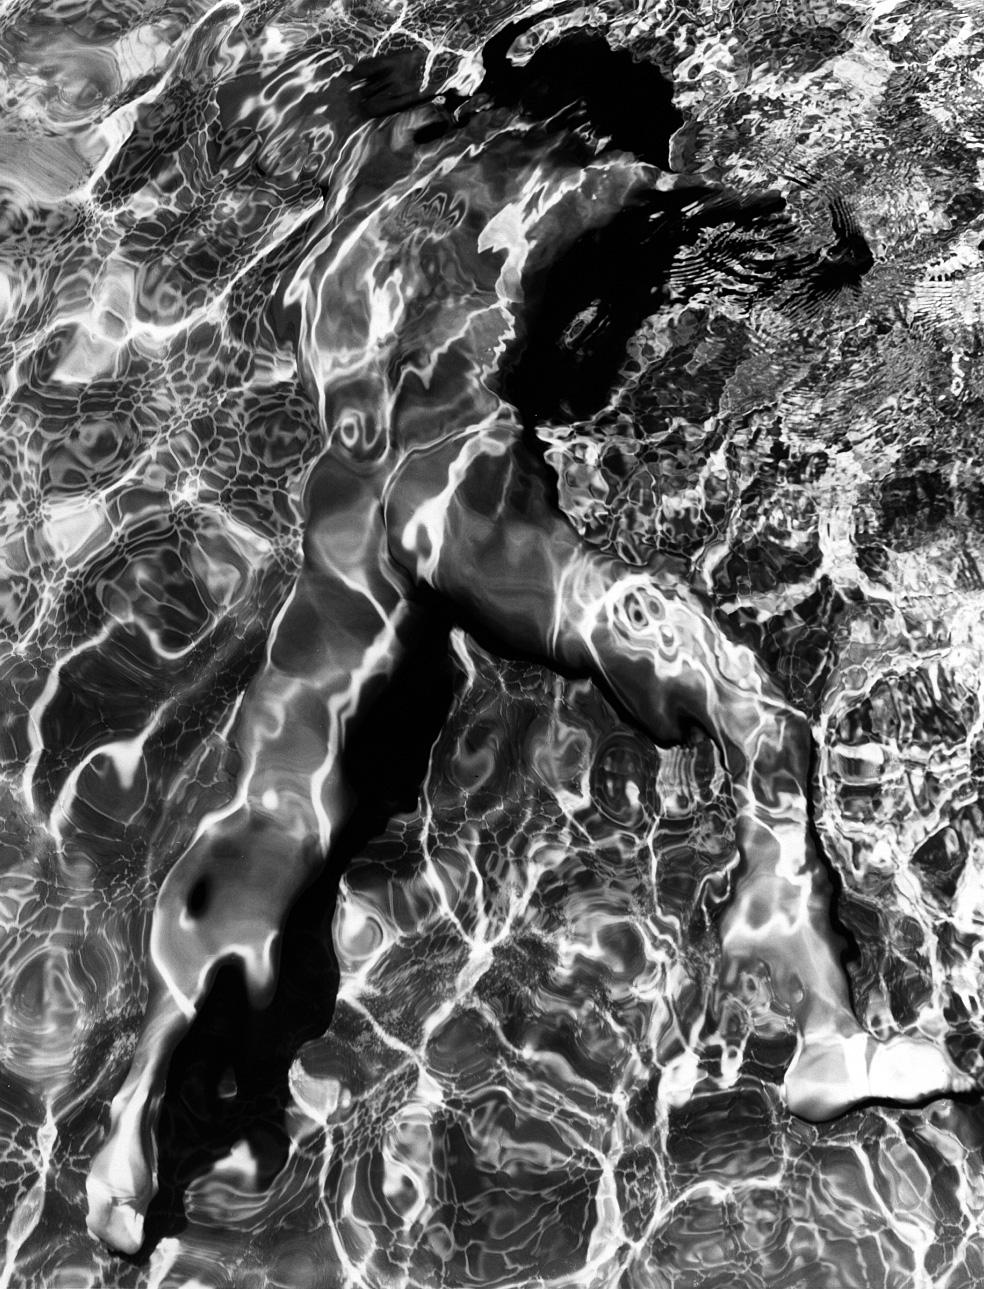 Swimming Pool Study © Greg Gorman